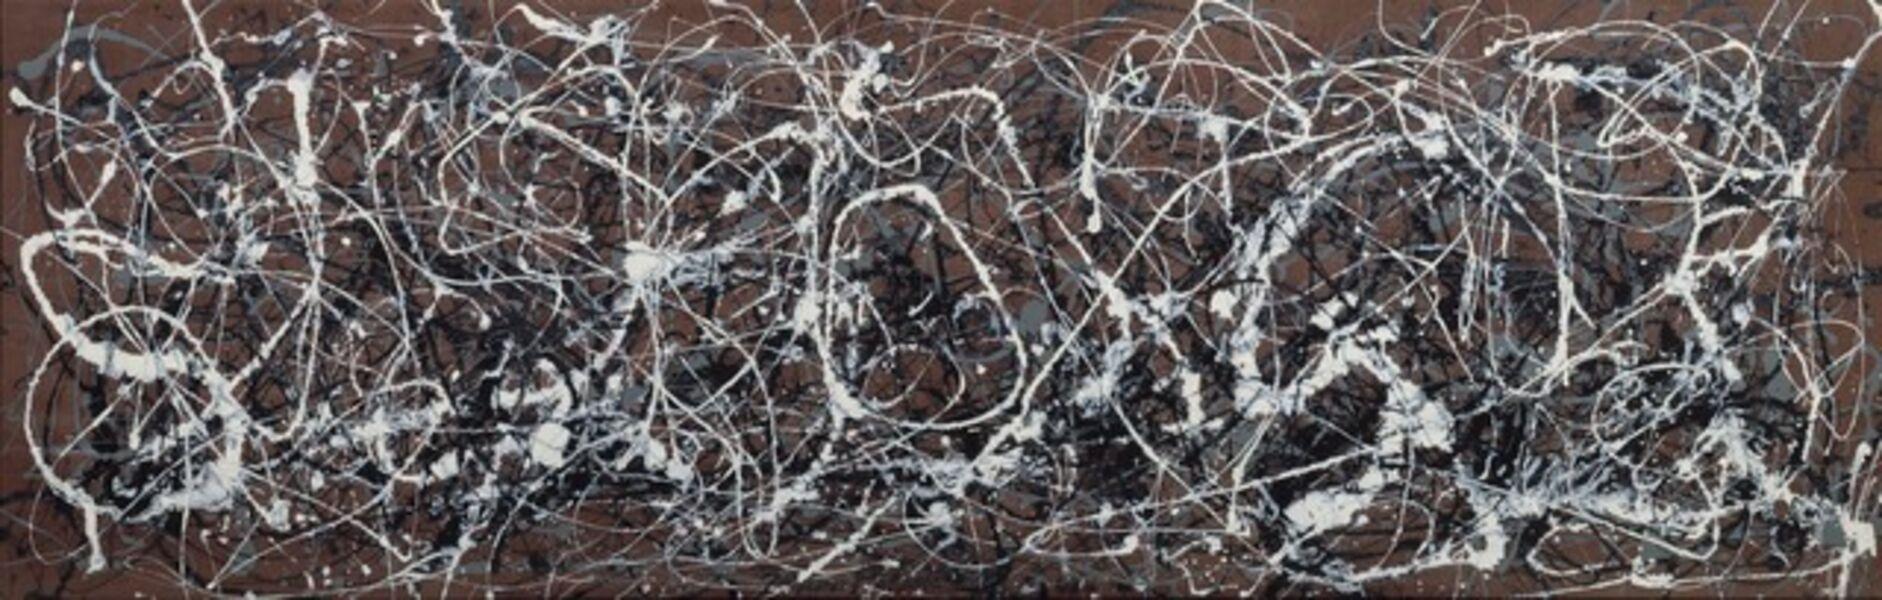 Jackson Pollock, 'Number 13A: Arabesque', 1948